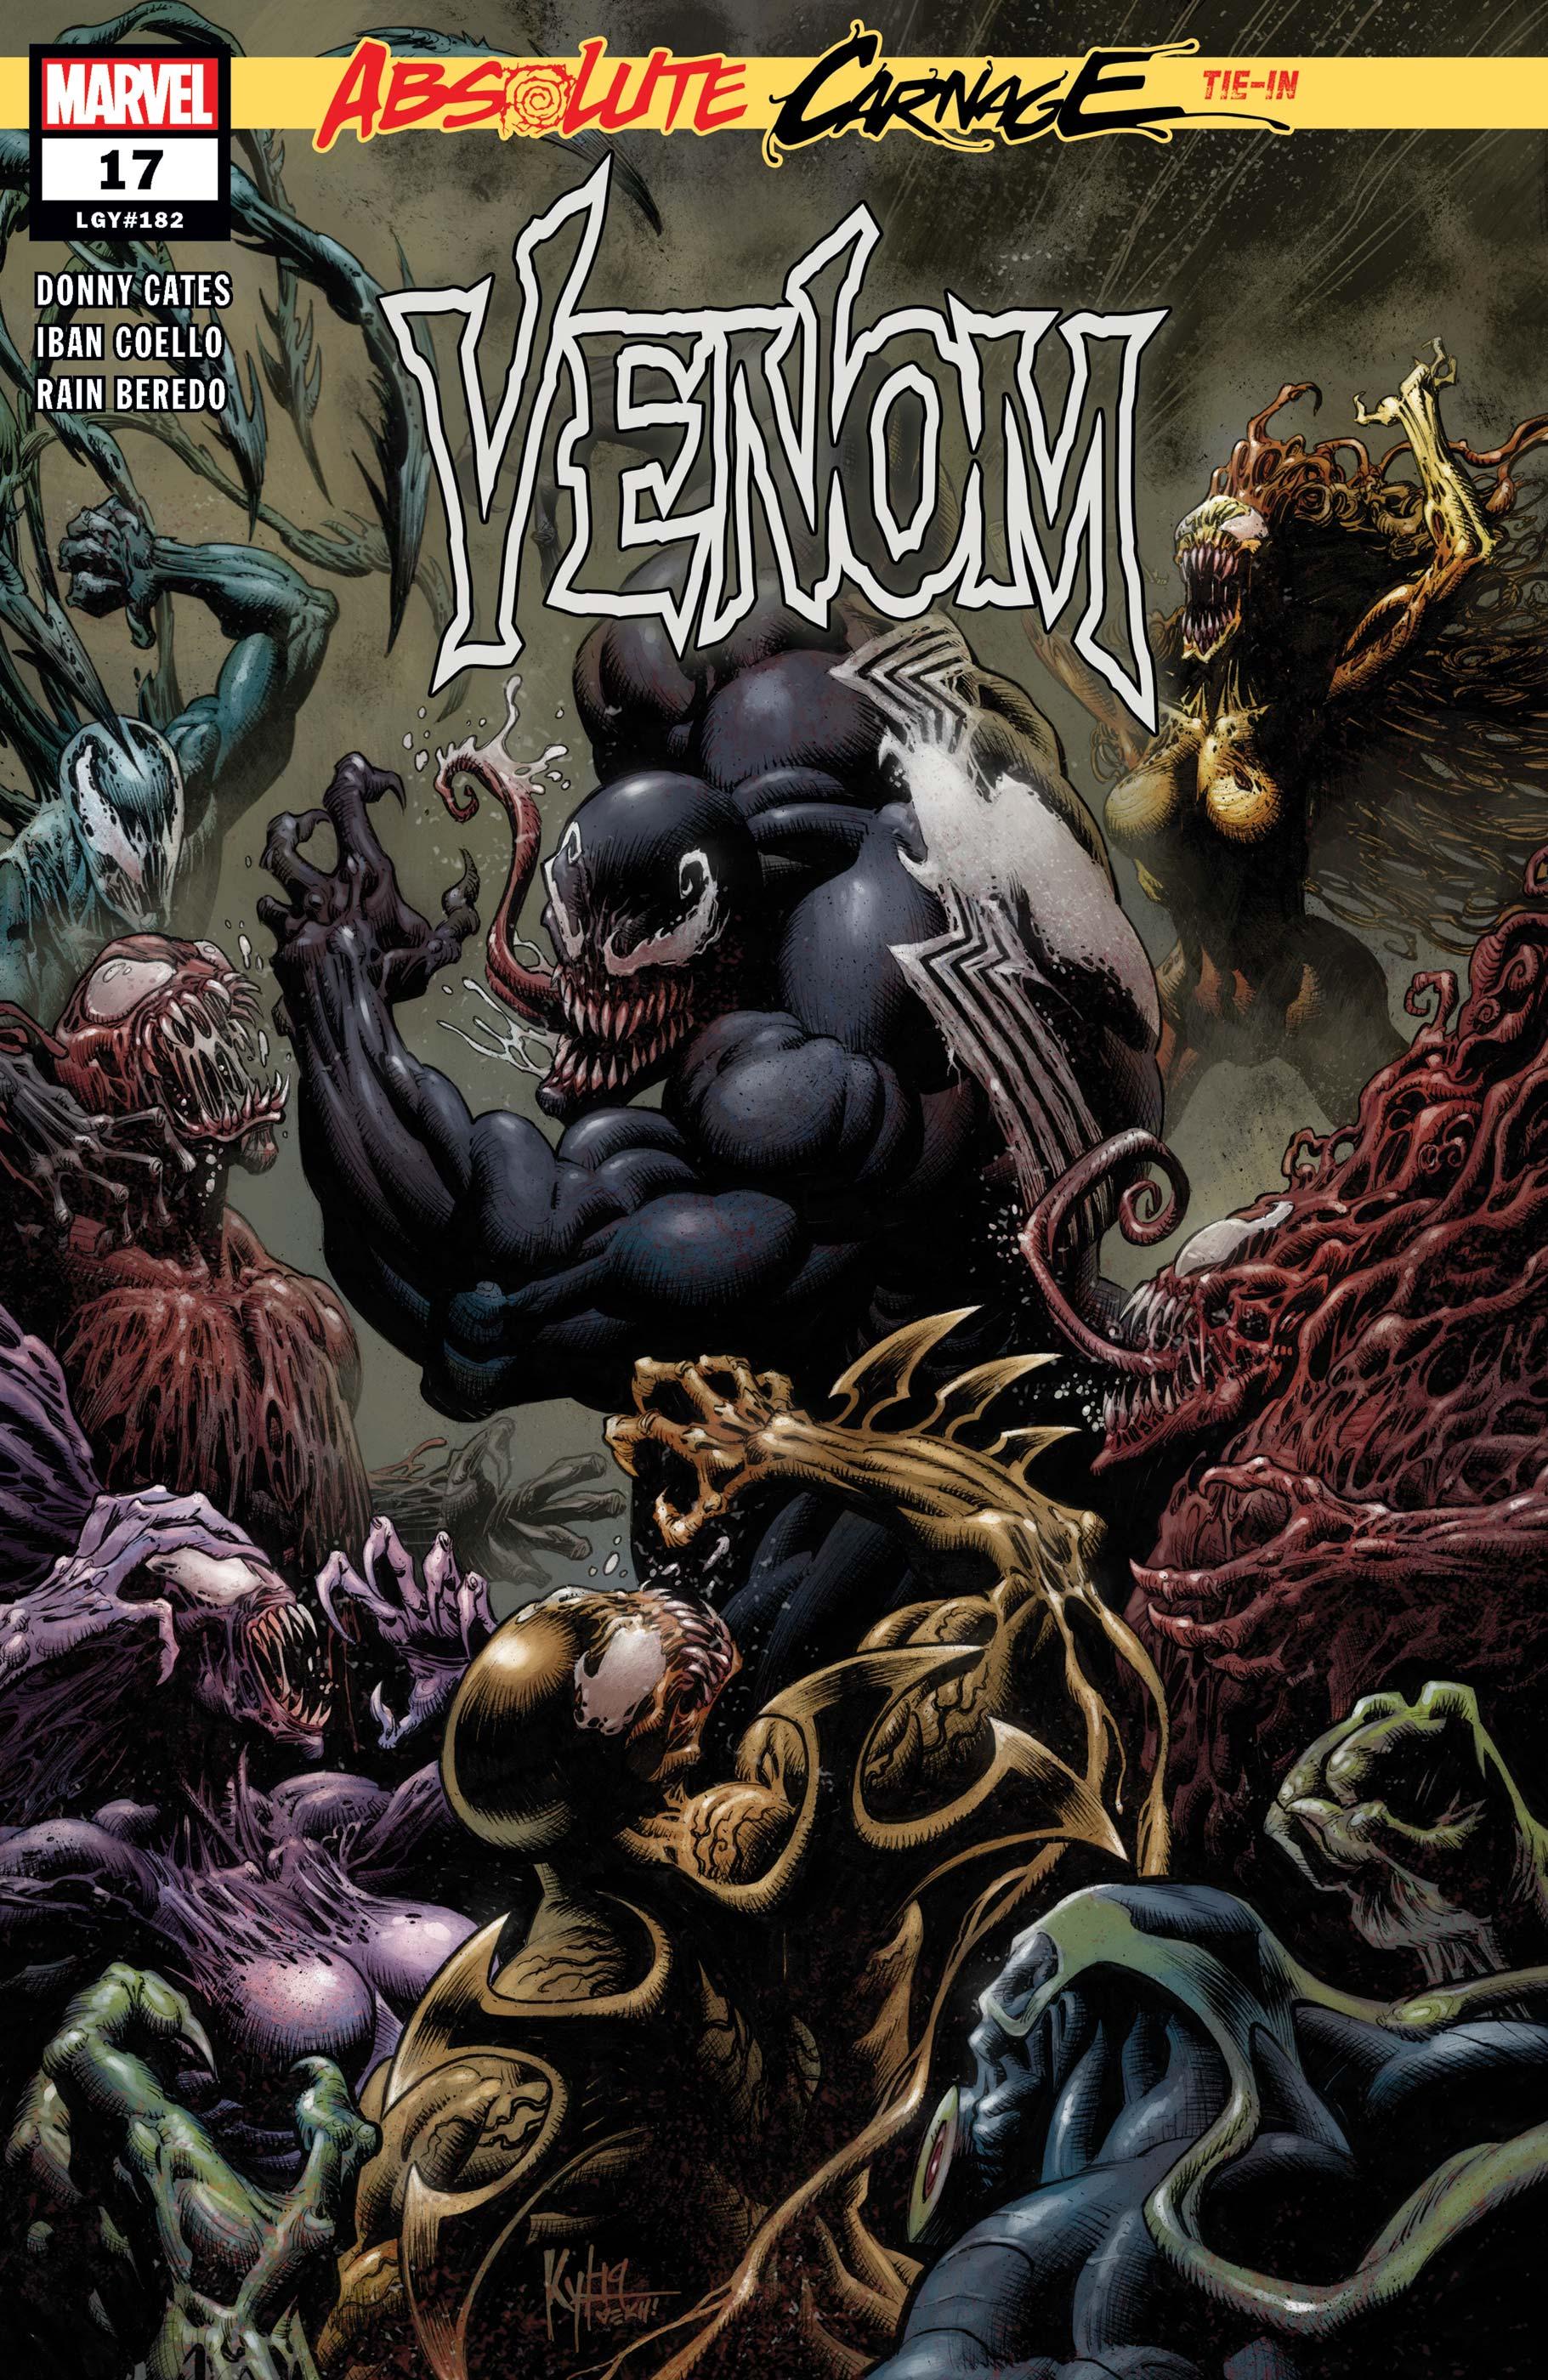 Venom (2018) #17